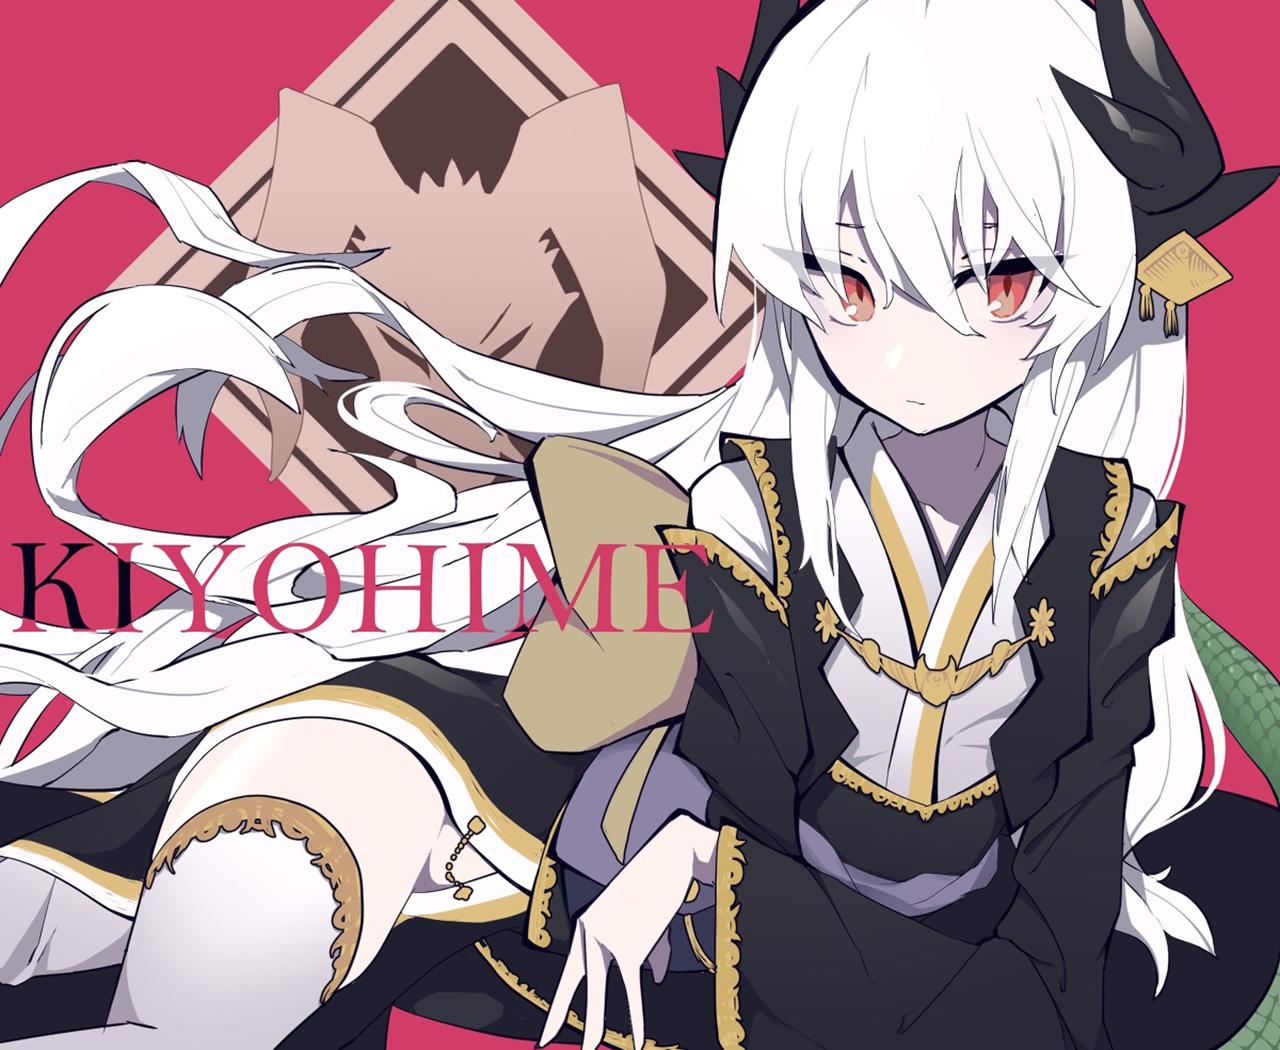 Anime 1280x1050 anime anime girls illustration Kiyohime (Fate/Grand Order) Fate/Grand Order